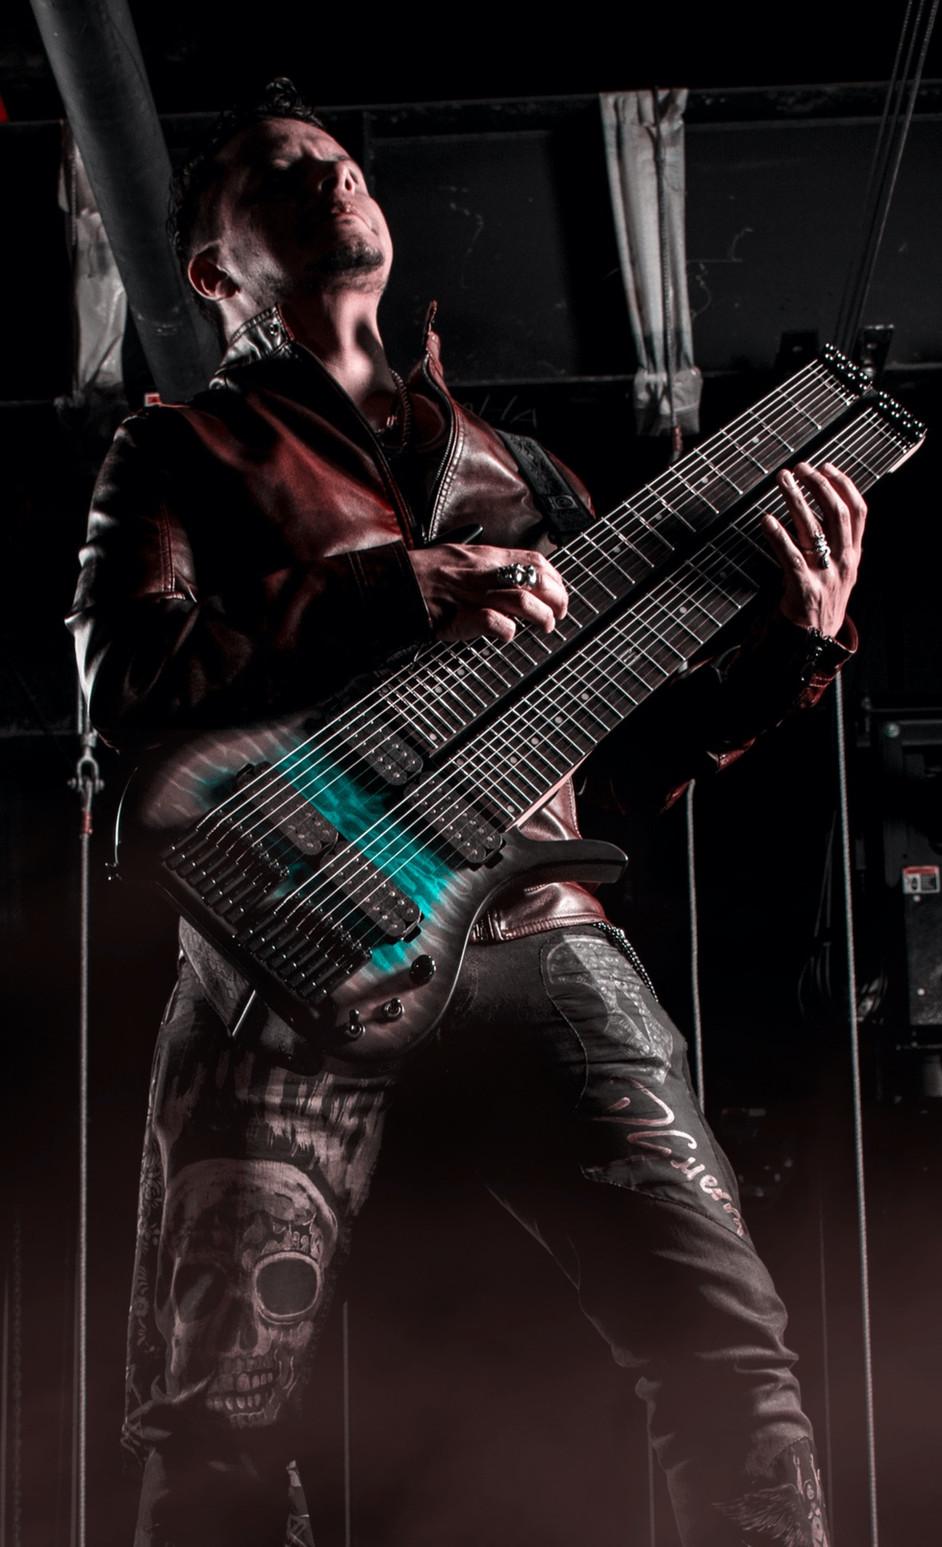 diego guerra fm guitars2_edited.jpg